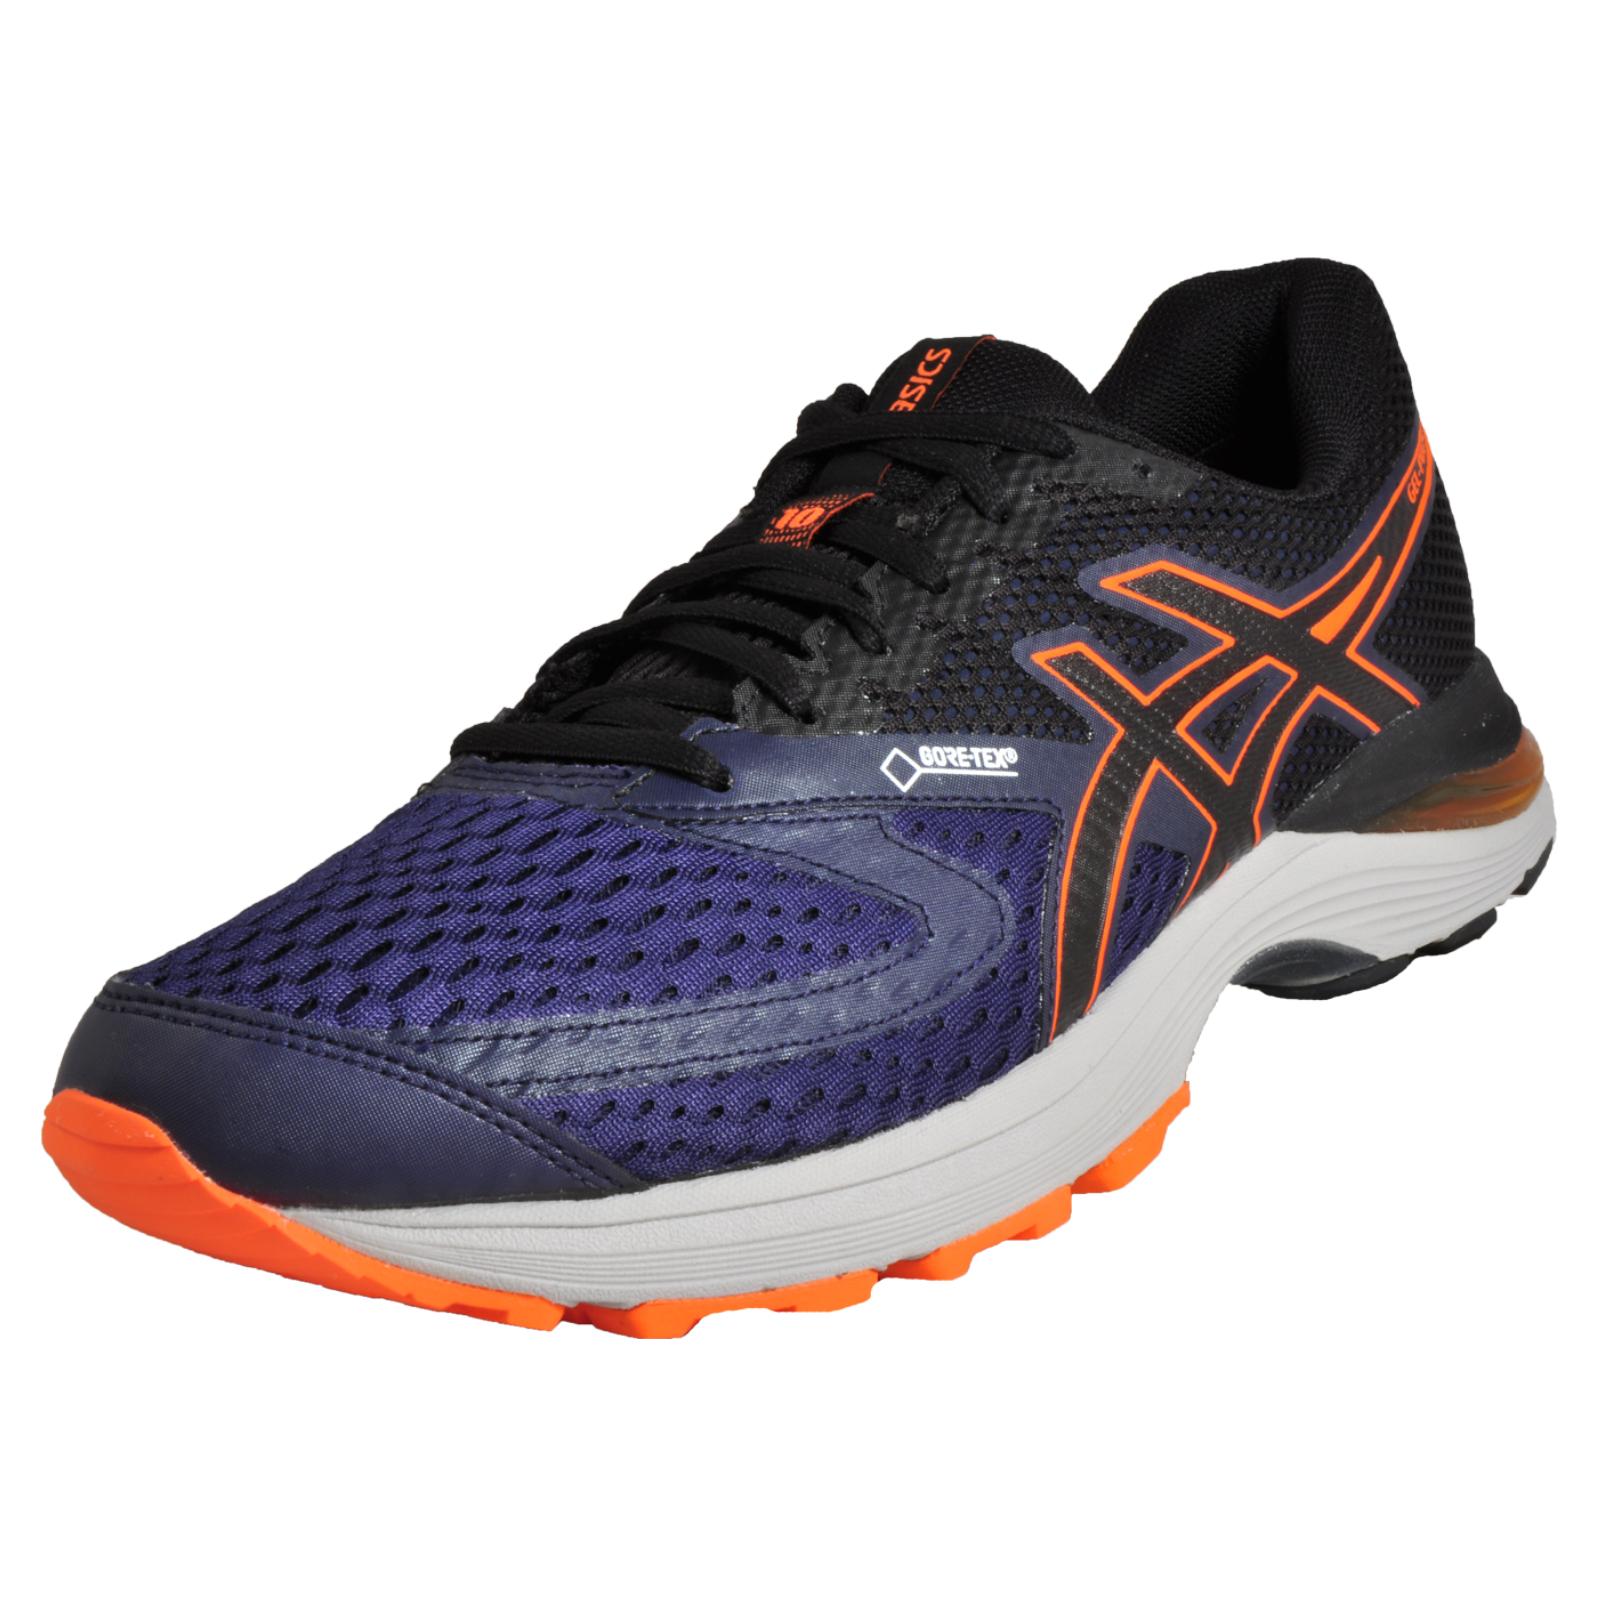 Asics Gel Pulse 10 GTX Gore-Tex Waterproof Men s Running Shoes Trainers 8a7fce281dc